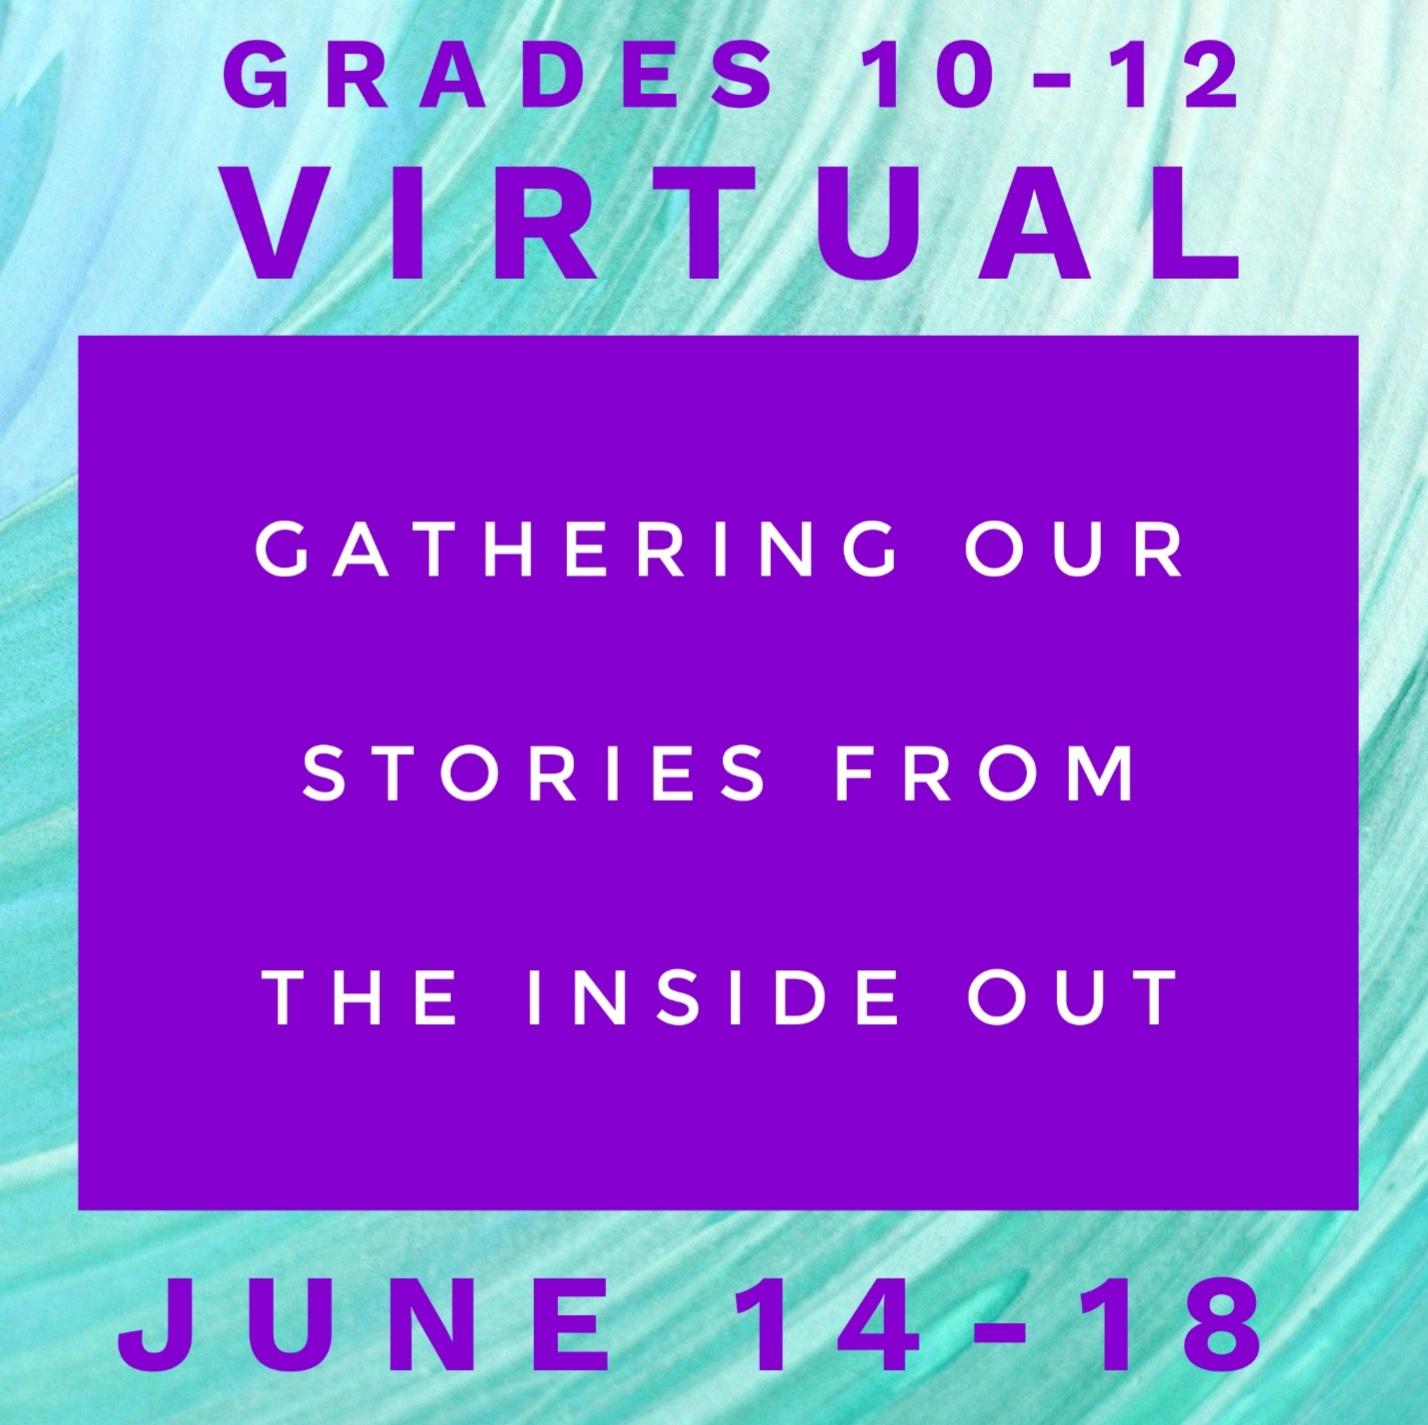 Summer Camp Grade 10-12 Virtual Image